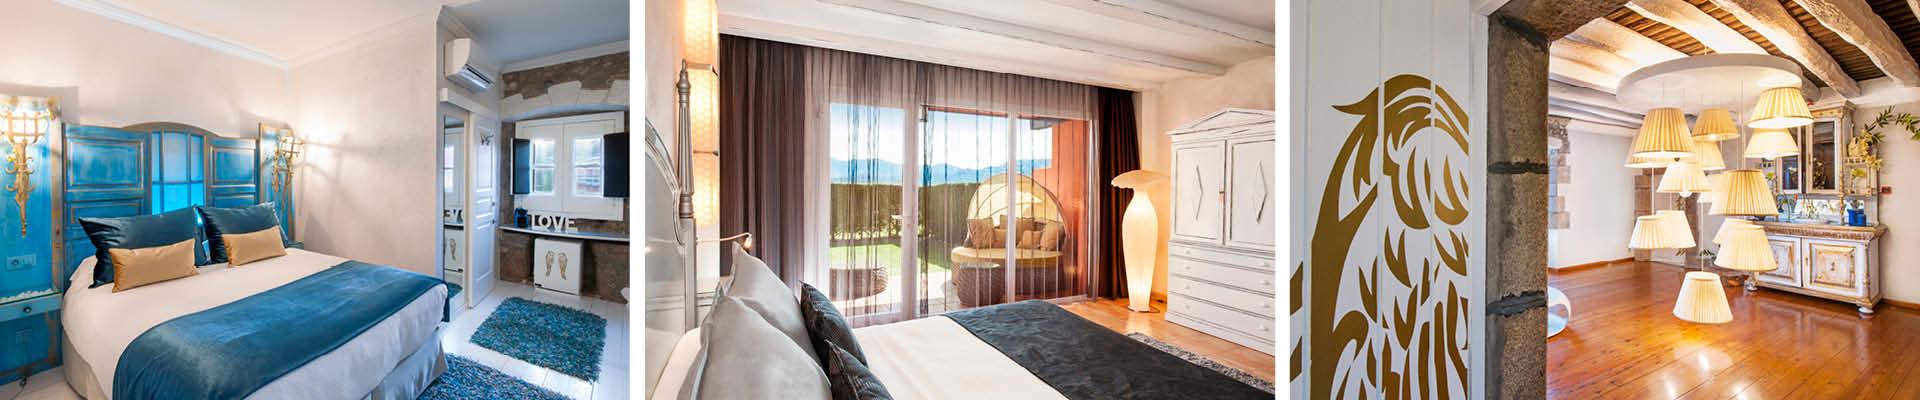 M-Motorradreisen Hotel Mas Tapiolas 4 Sterne Suiten